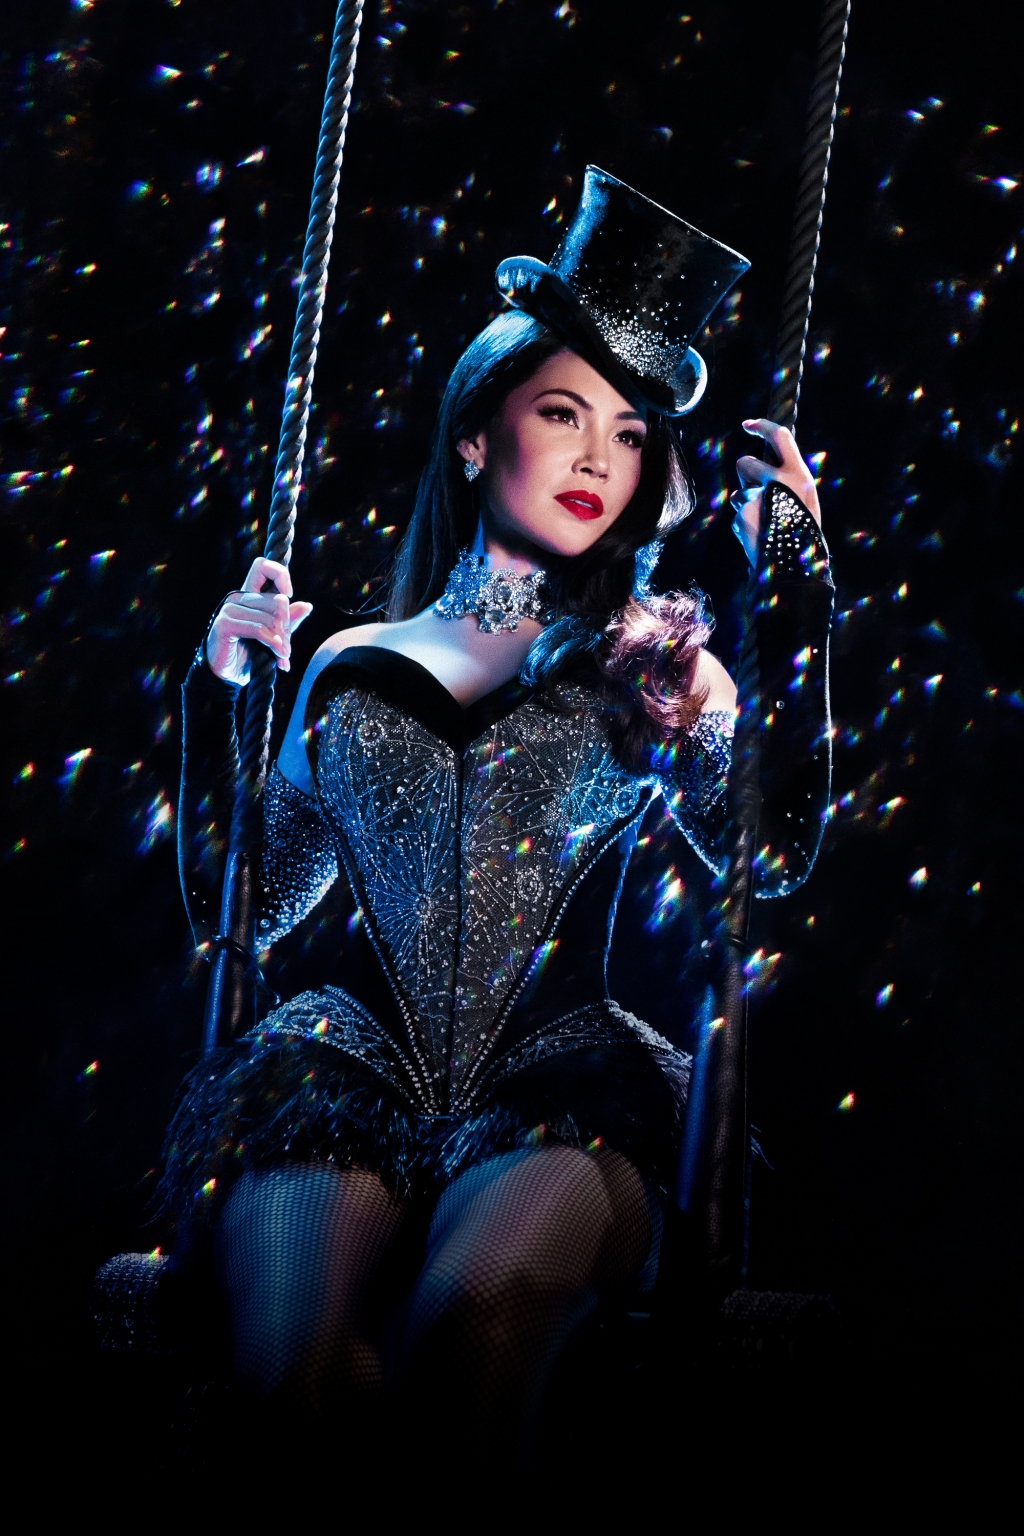 Moulin Rouge Natalie Mendoza